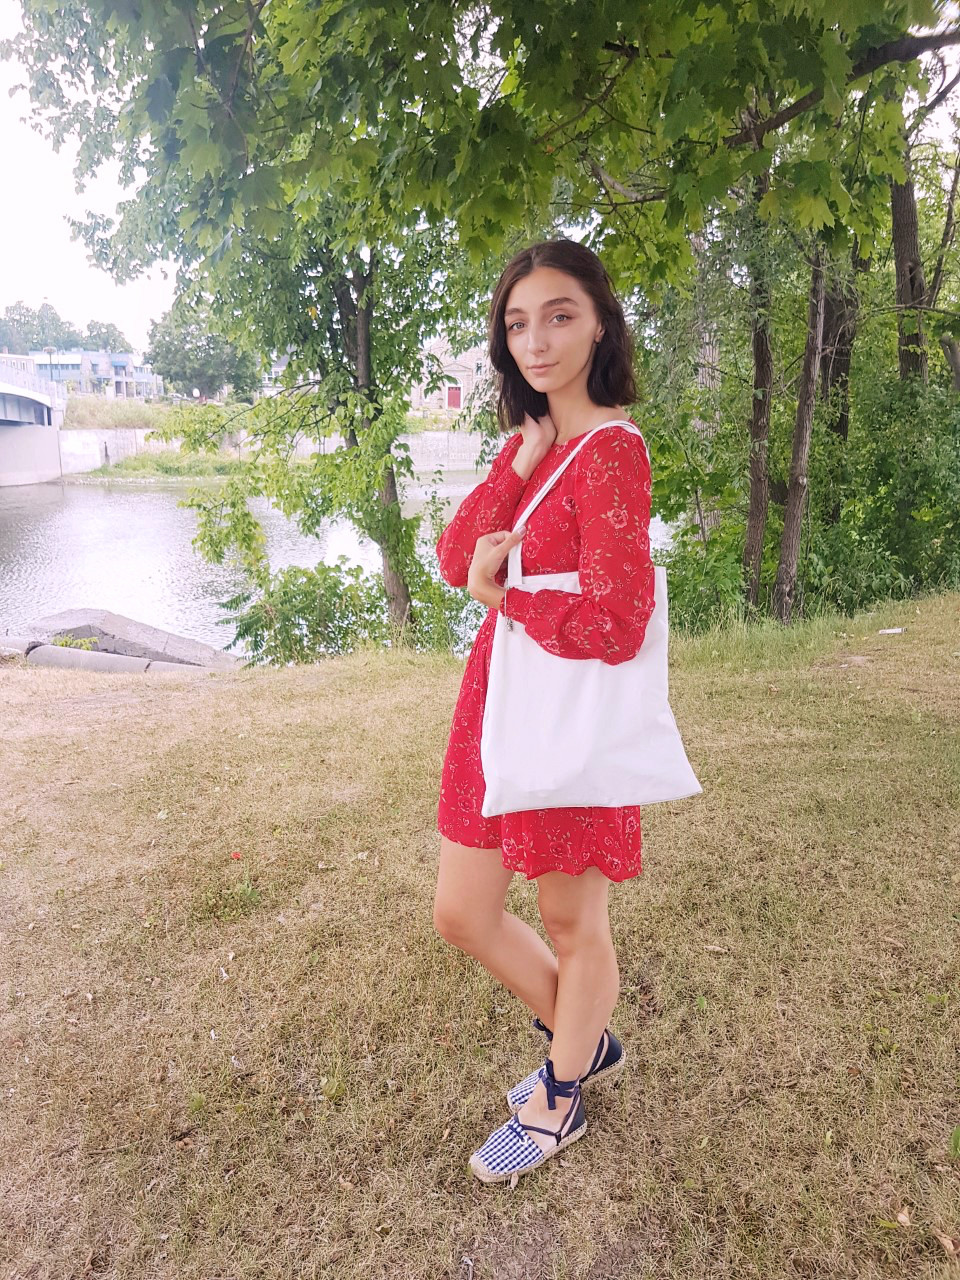 Dynamite Dress, Lifestyle, Summer, Street Style, Feminine, Dress, Sandals, Zara, Forever 21, Red Dress, Fashion, Beauty, Canadian Blogger, Montreal